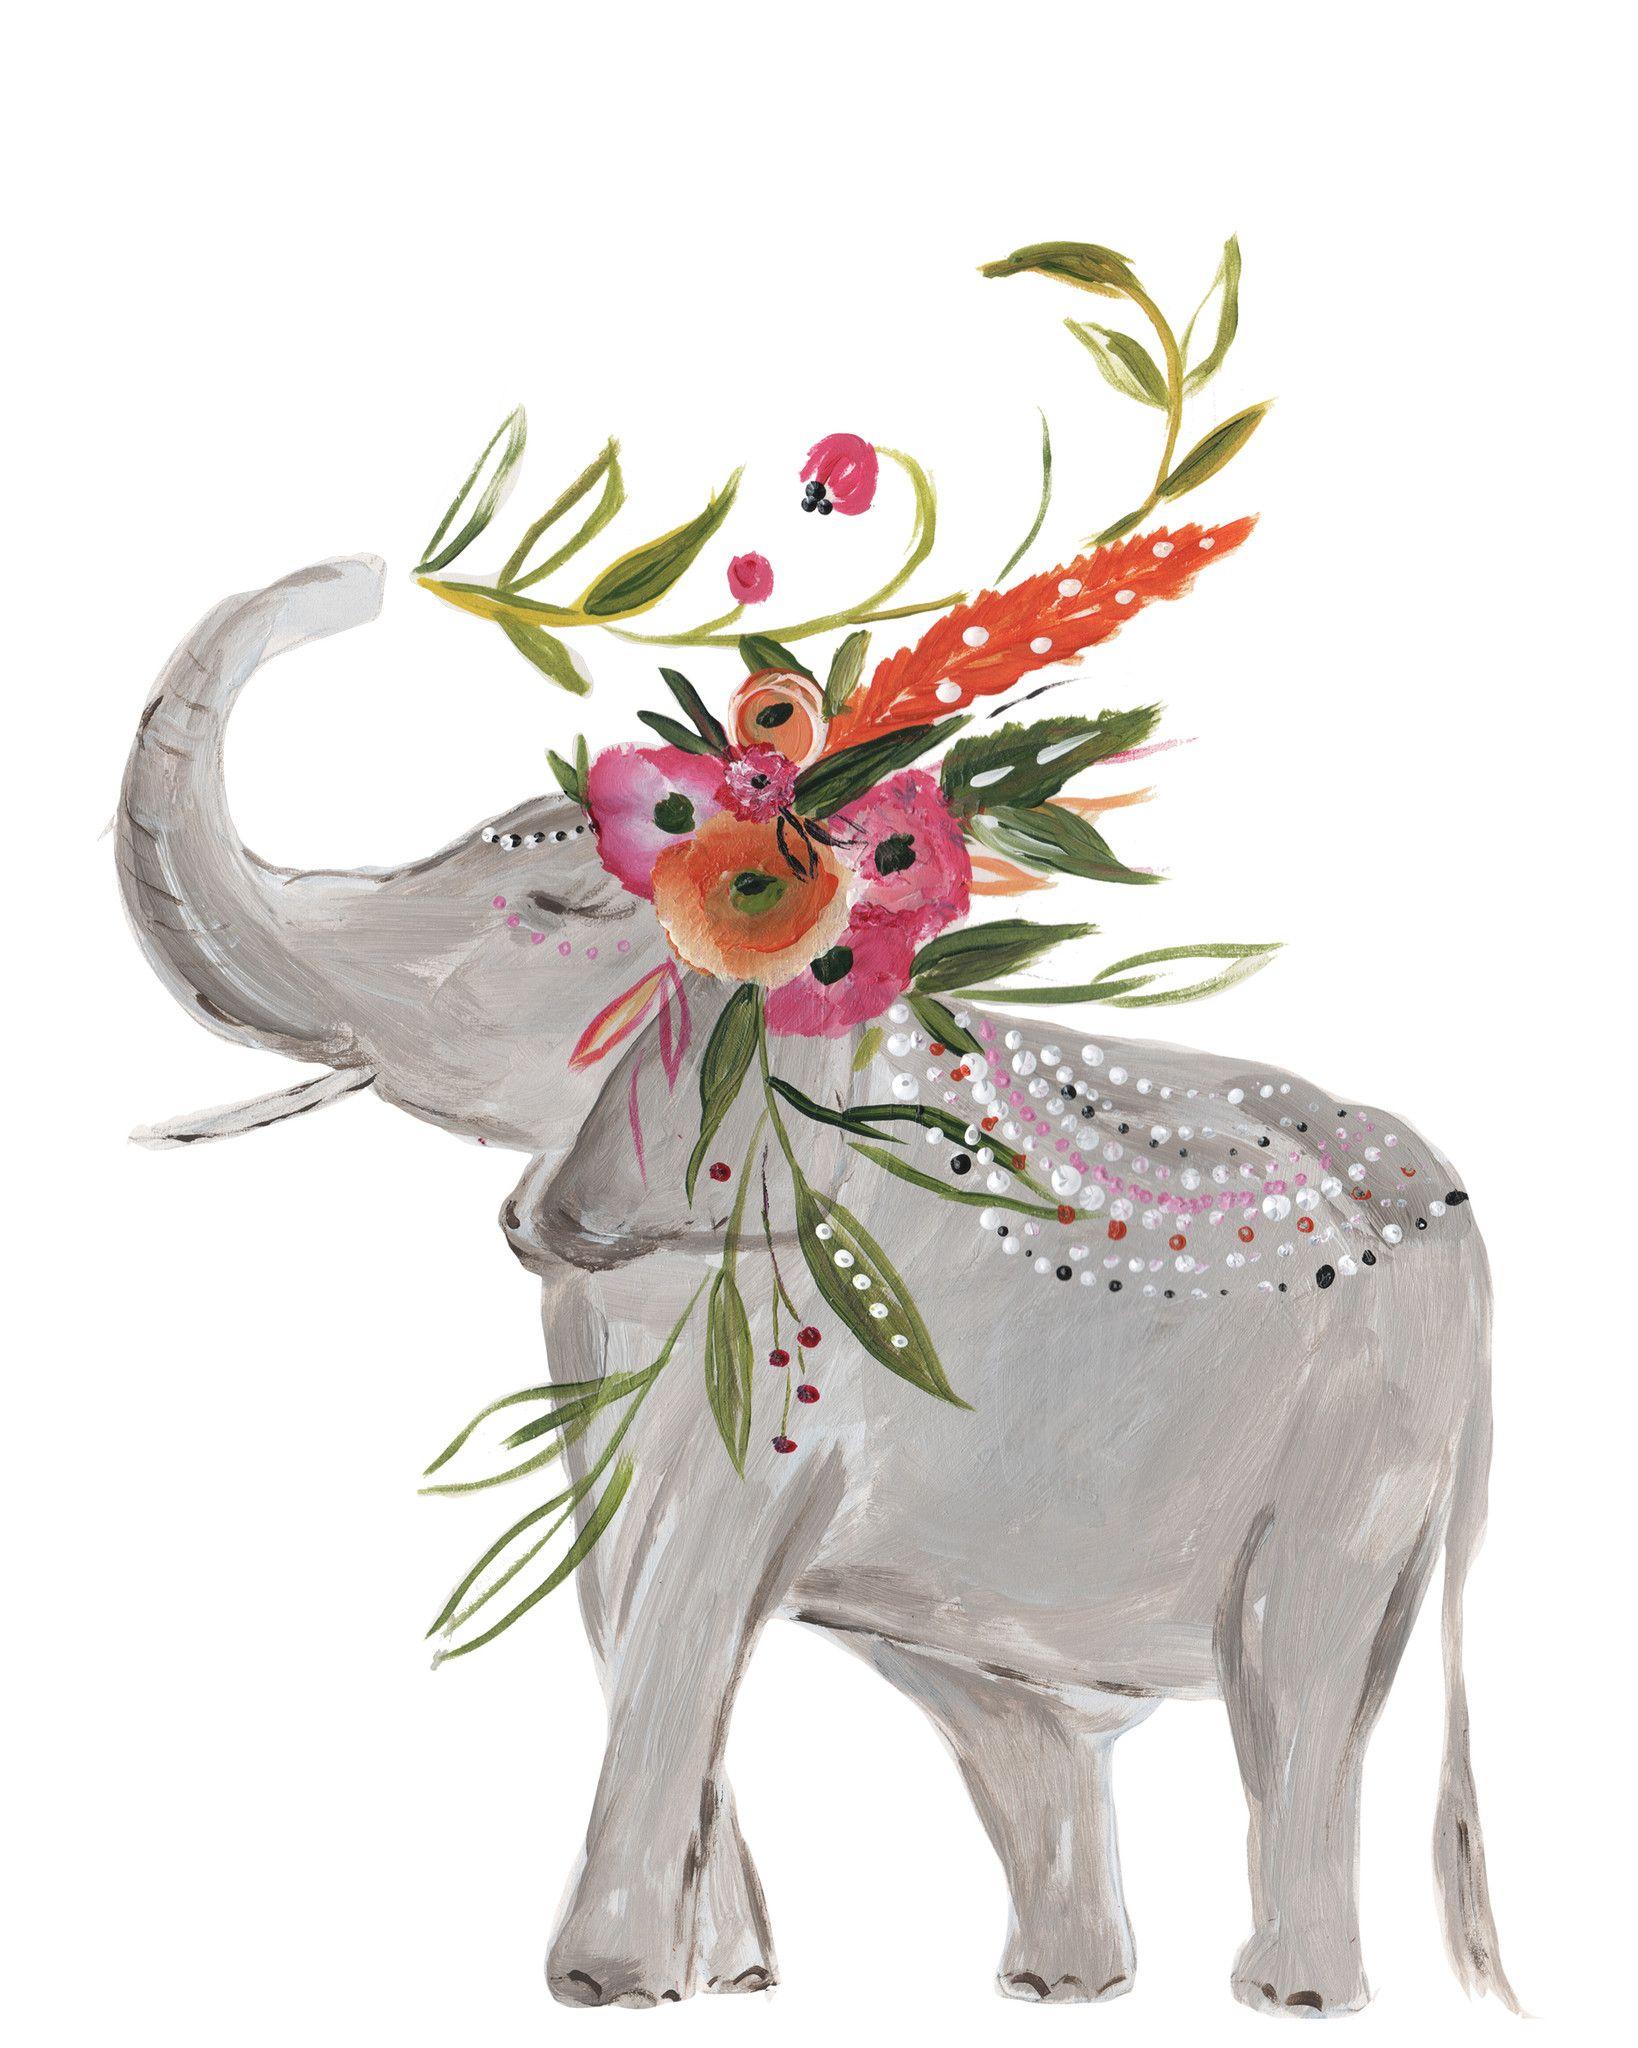 Boho elephant art print in 2018 india apartment decorating inspiration pinterest art - Dessin elephant ...